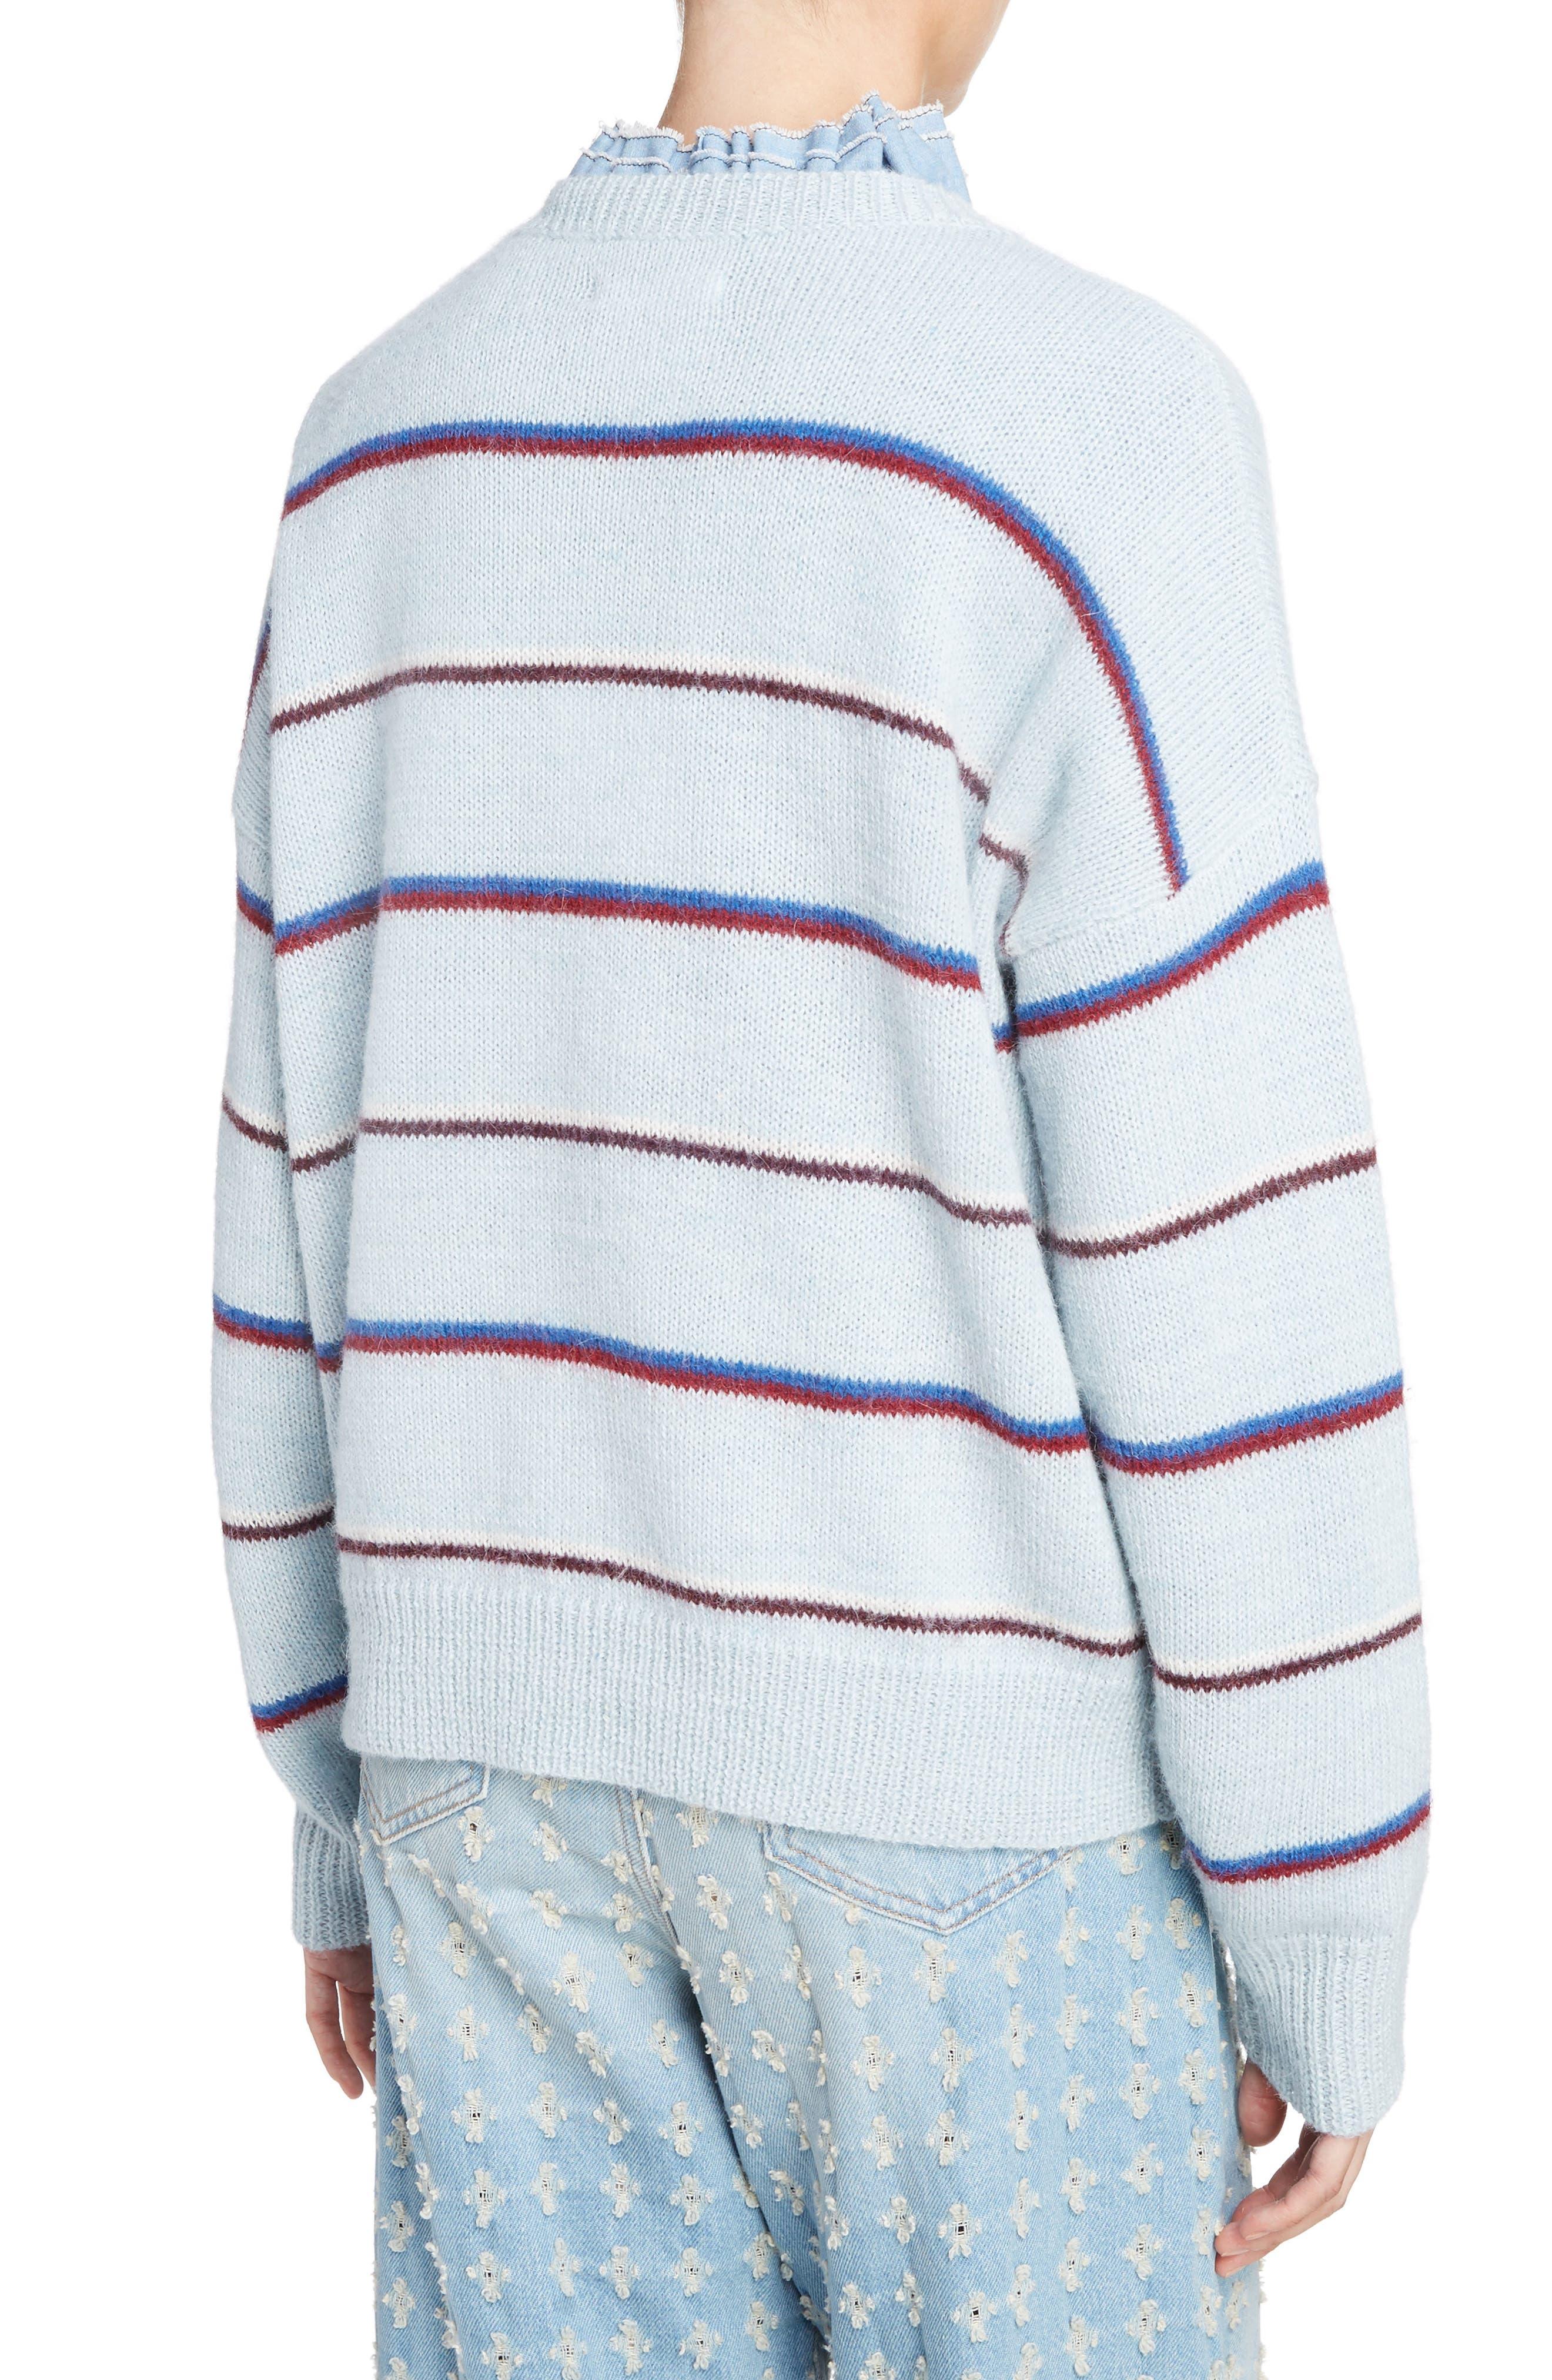 ISABEL MARANT ÉTOILE,                             Gatlin Stripe Alpaca Blend Sweater,                             Alternate thumbnail 2, color,                             400